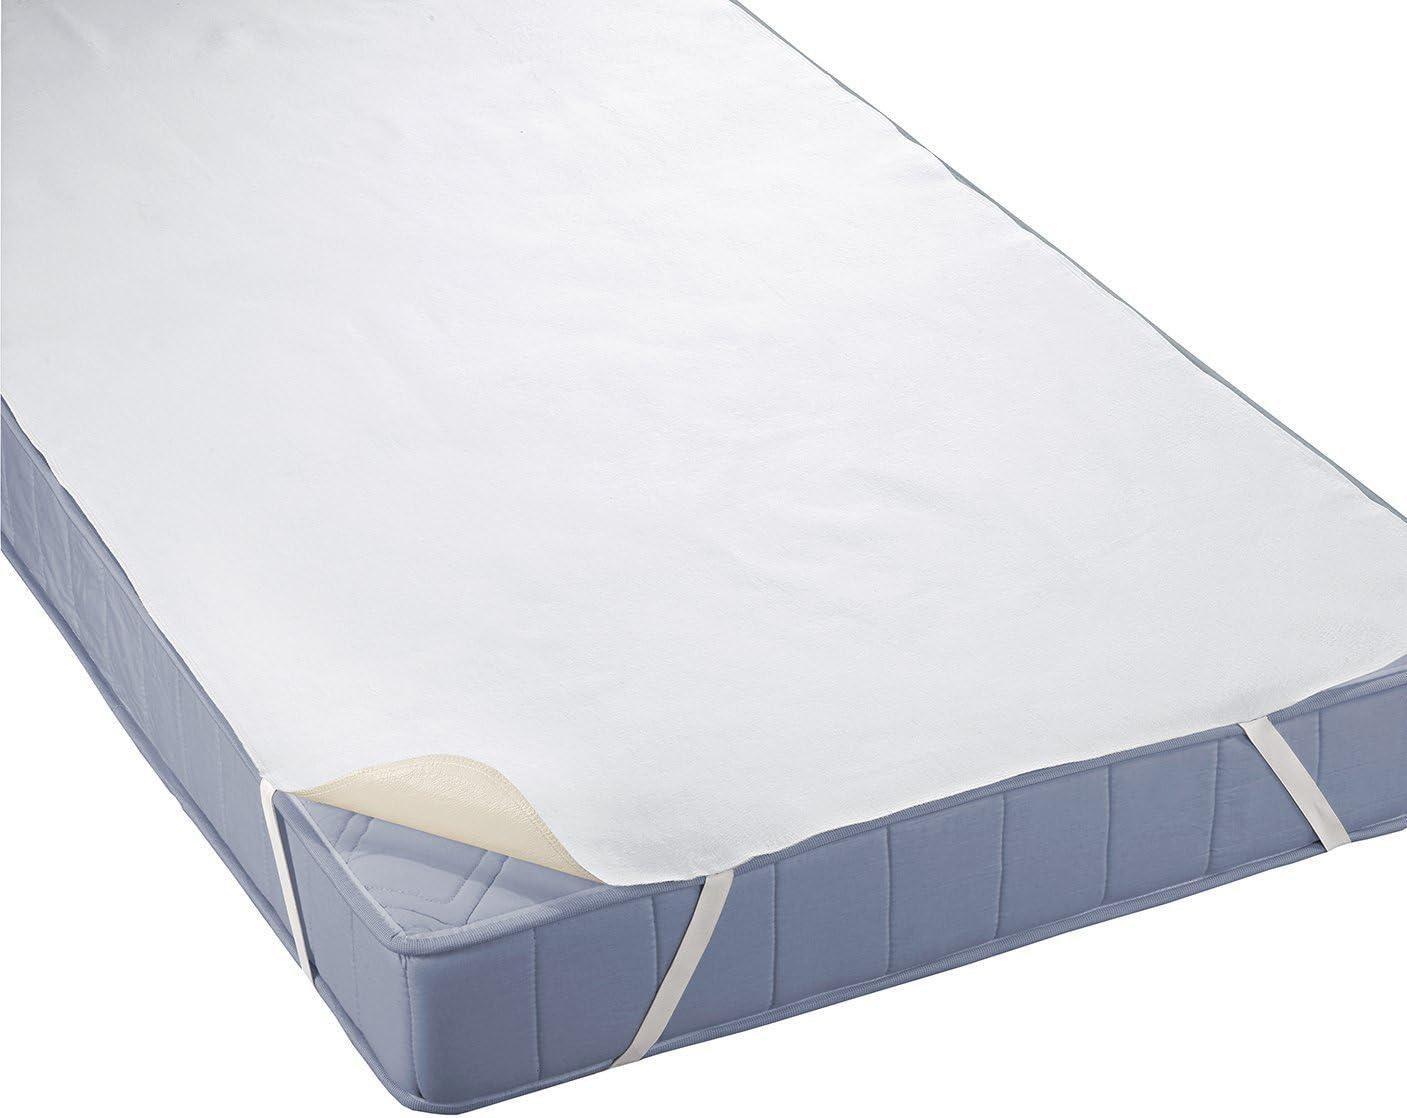 Color Blanco triple capa, SilverCare Protector de Colch/ón Impermeable 70 x 140 cm Biberna 809720-001-140 Molton